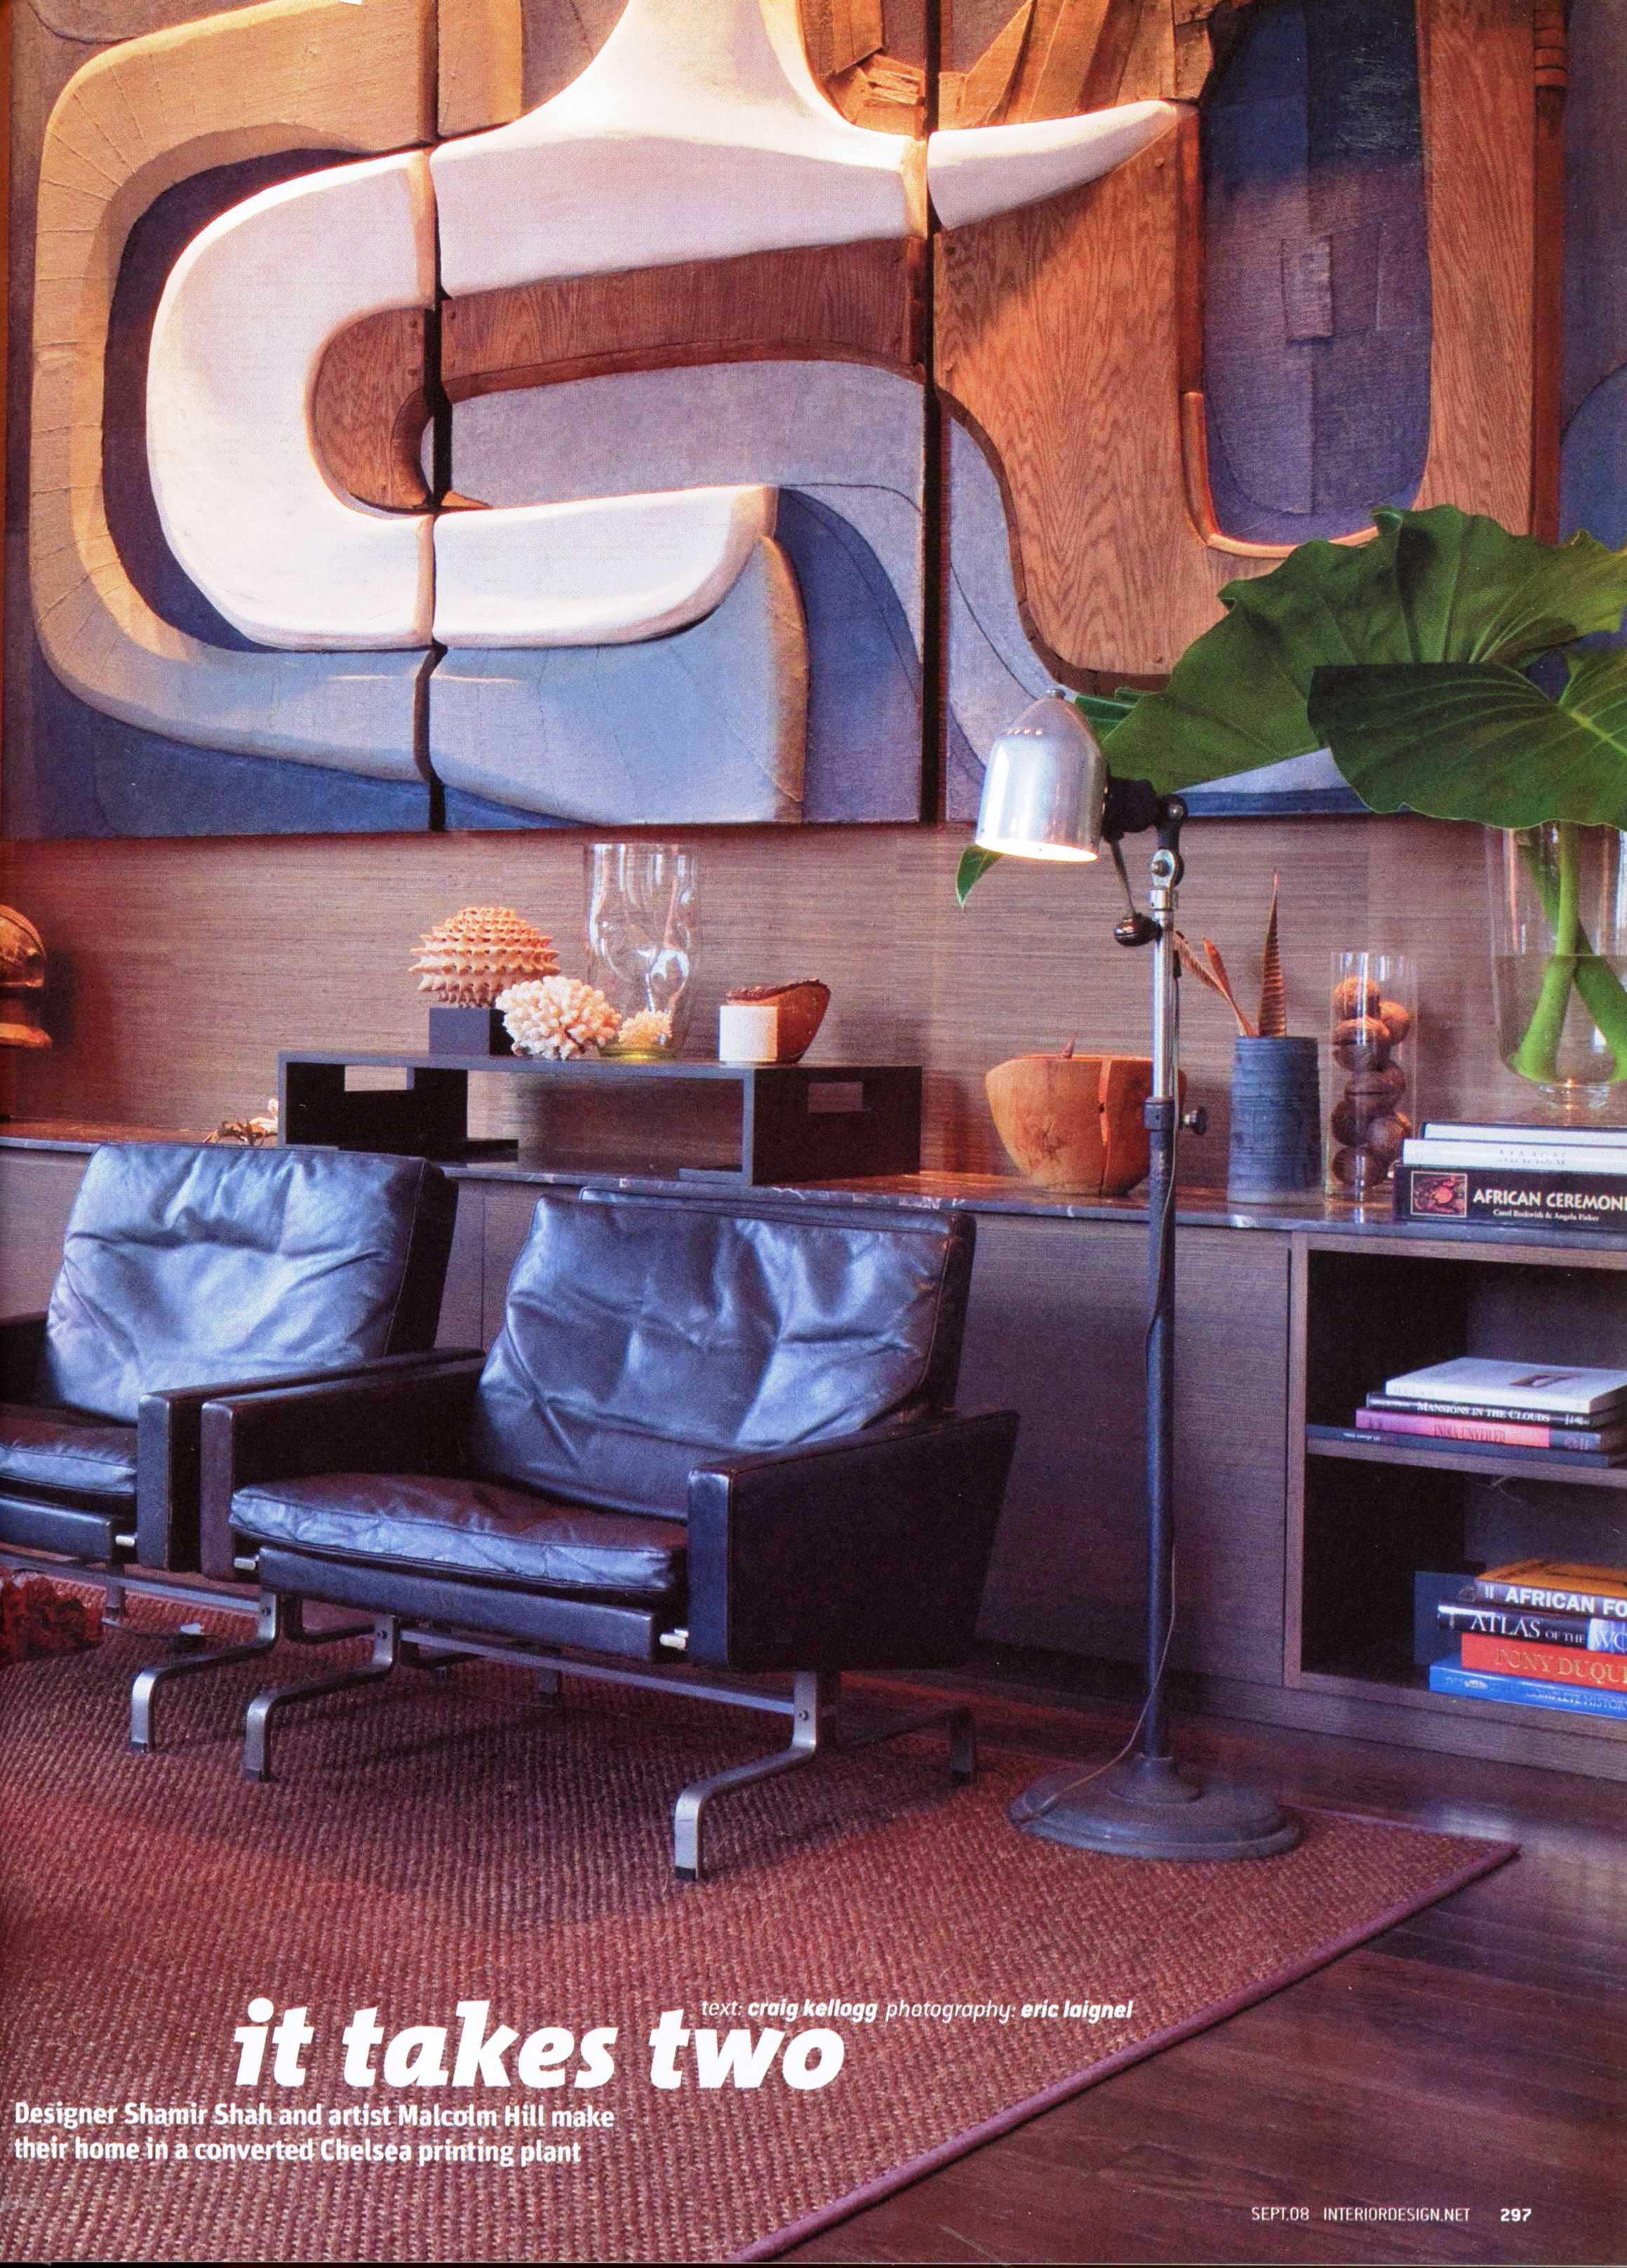 Interior Design_Sept 08_SS Apt_Full Article_Page_3.jpg